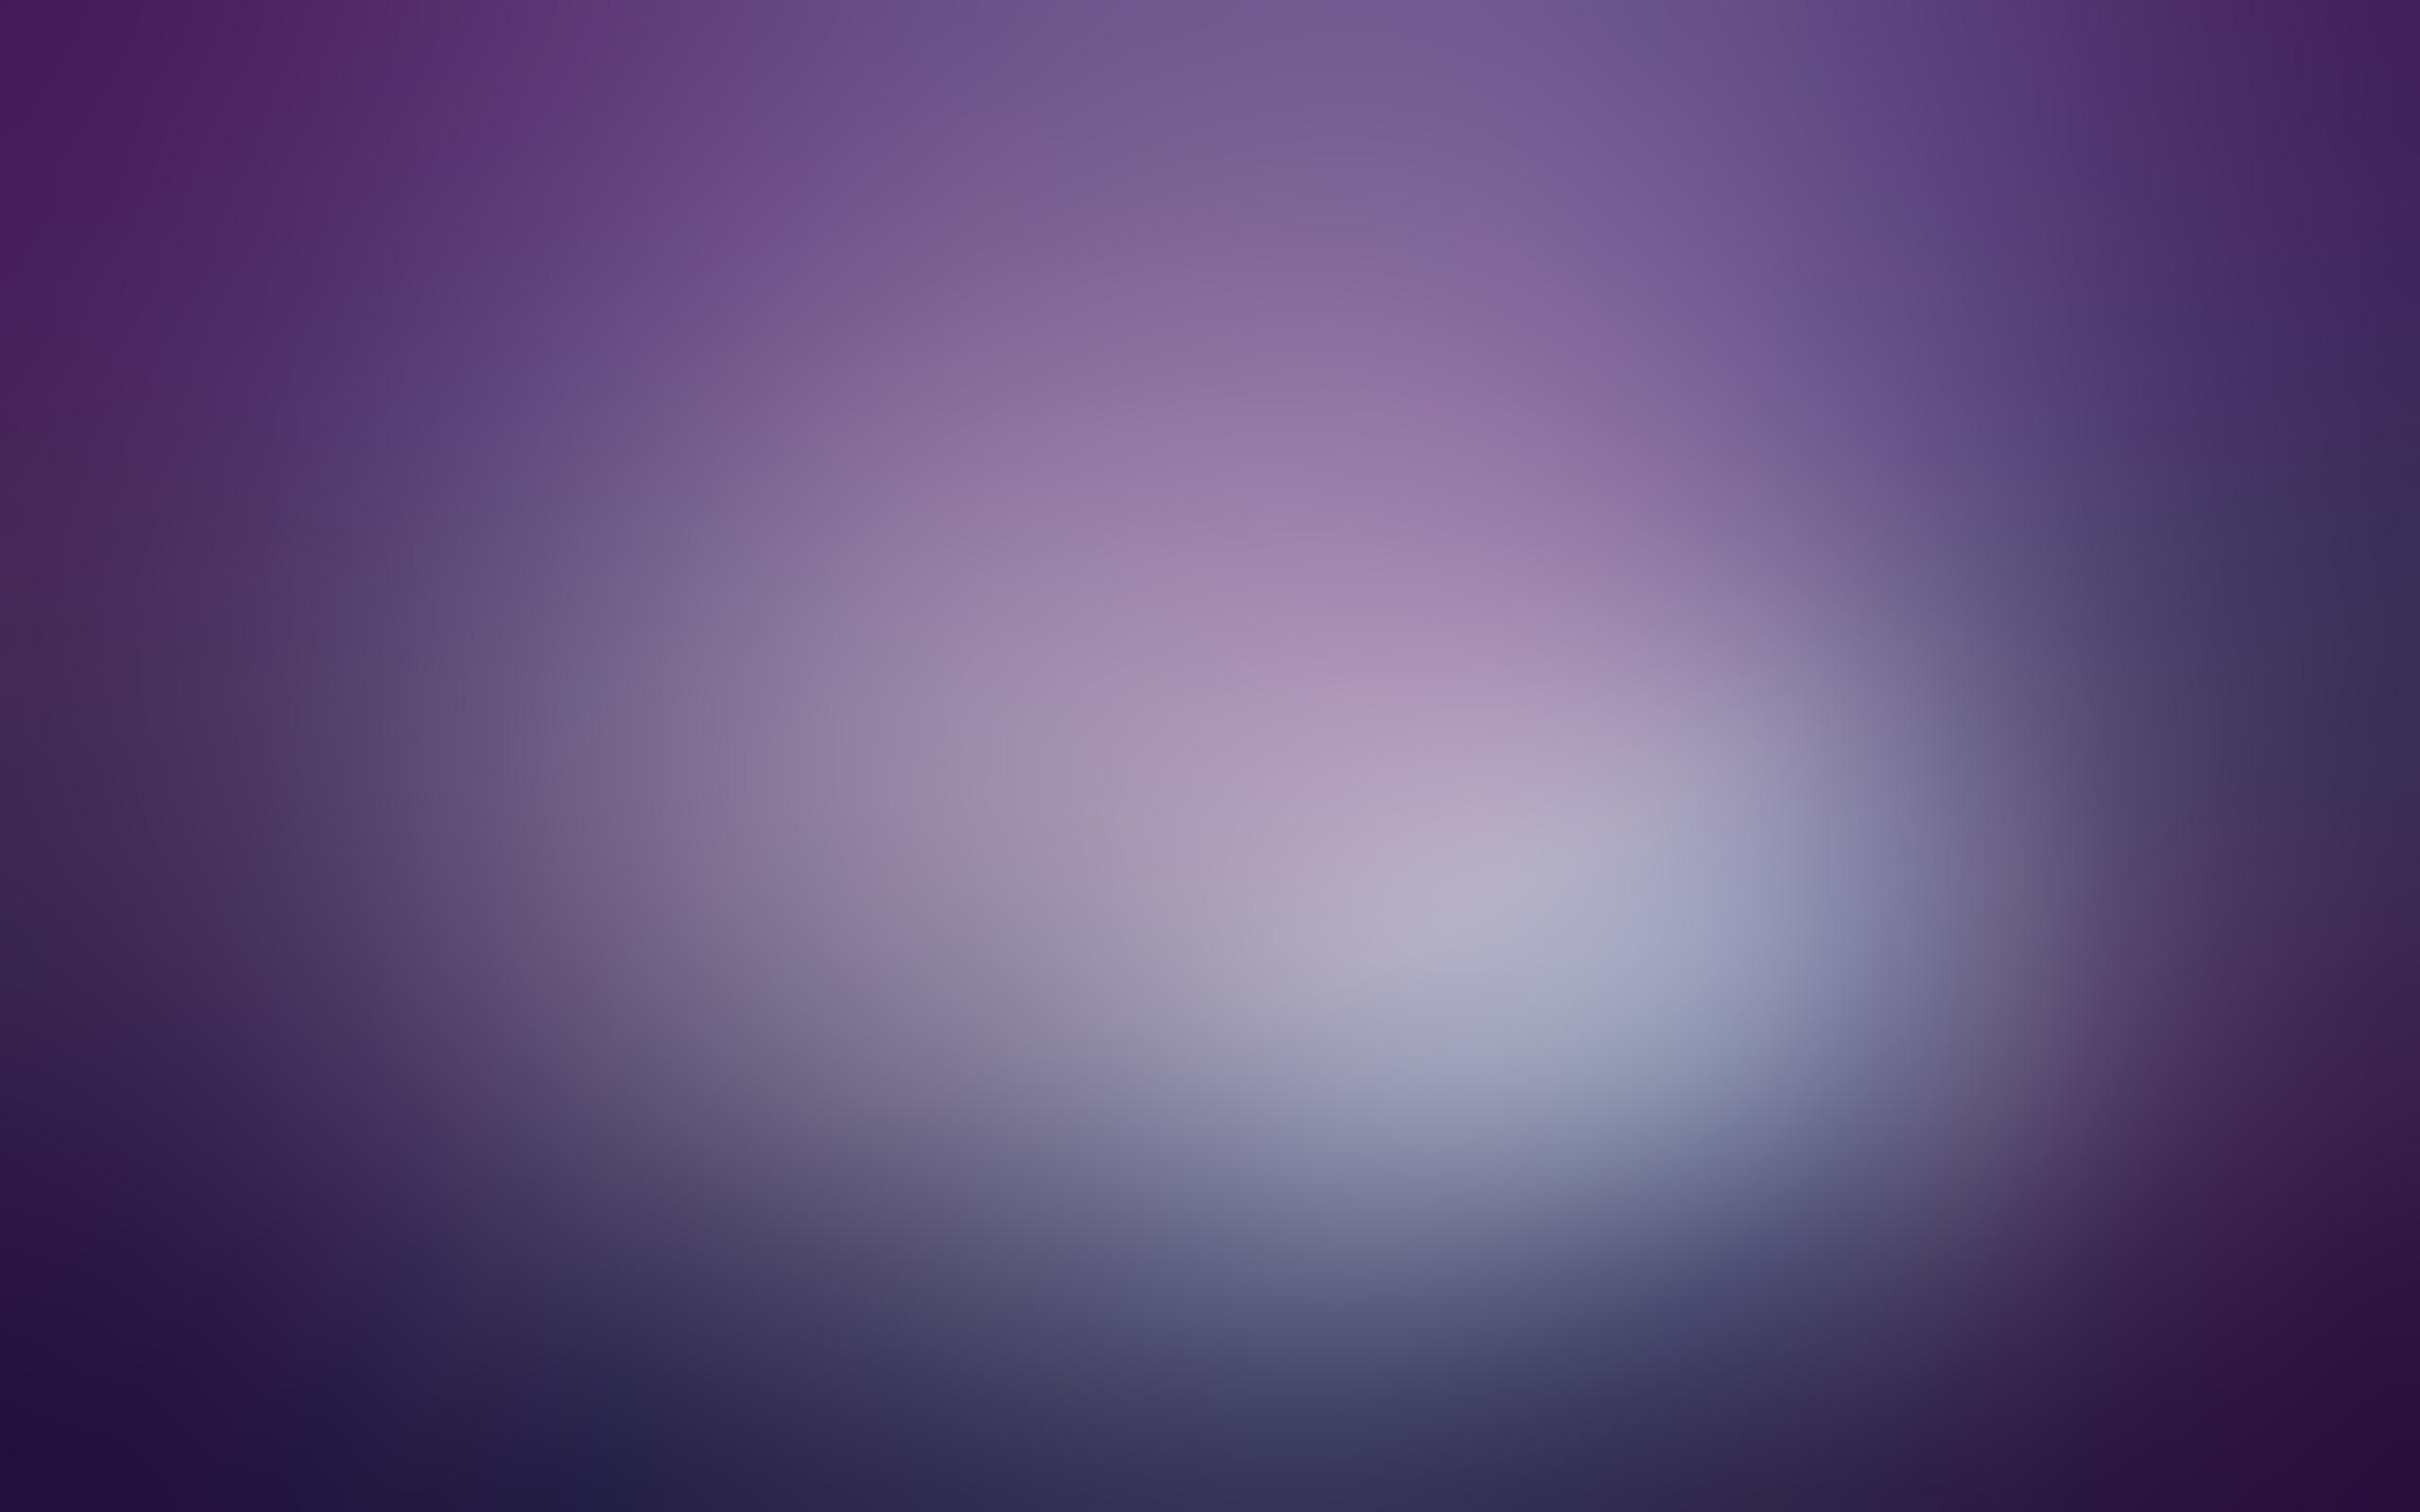 purple silver and black wallpaper 12 background wallpaper